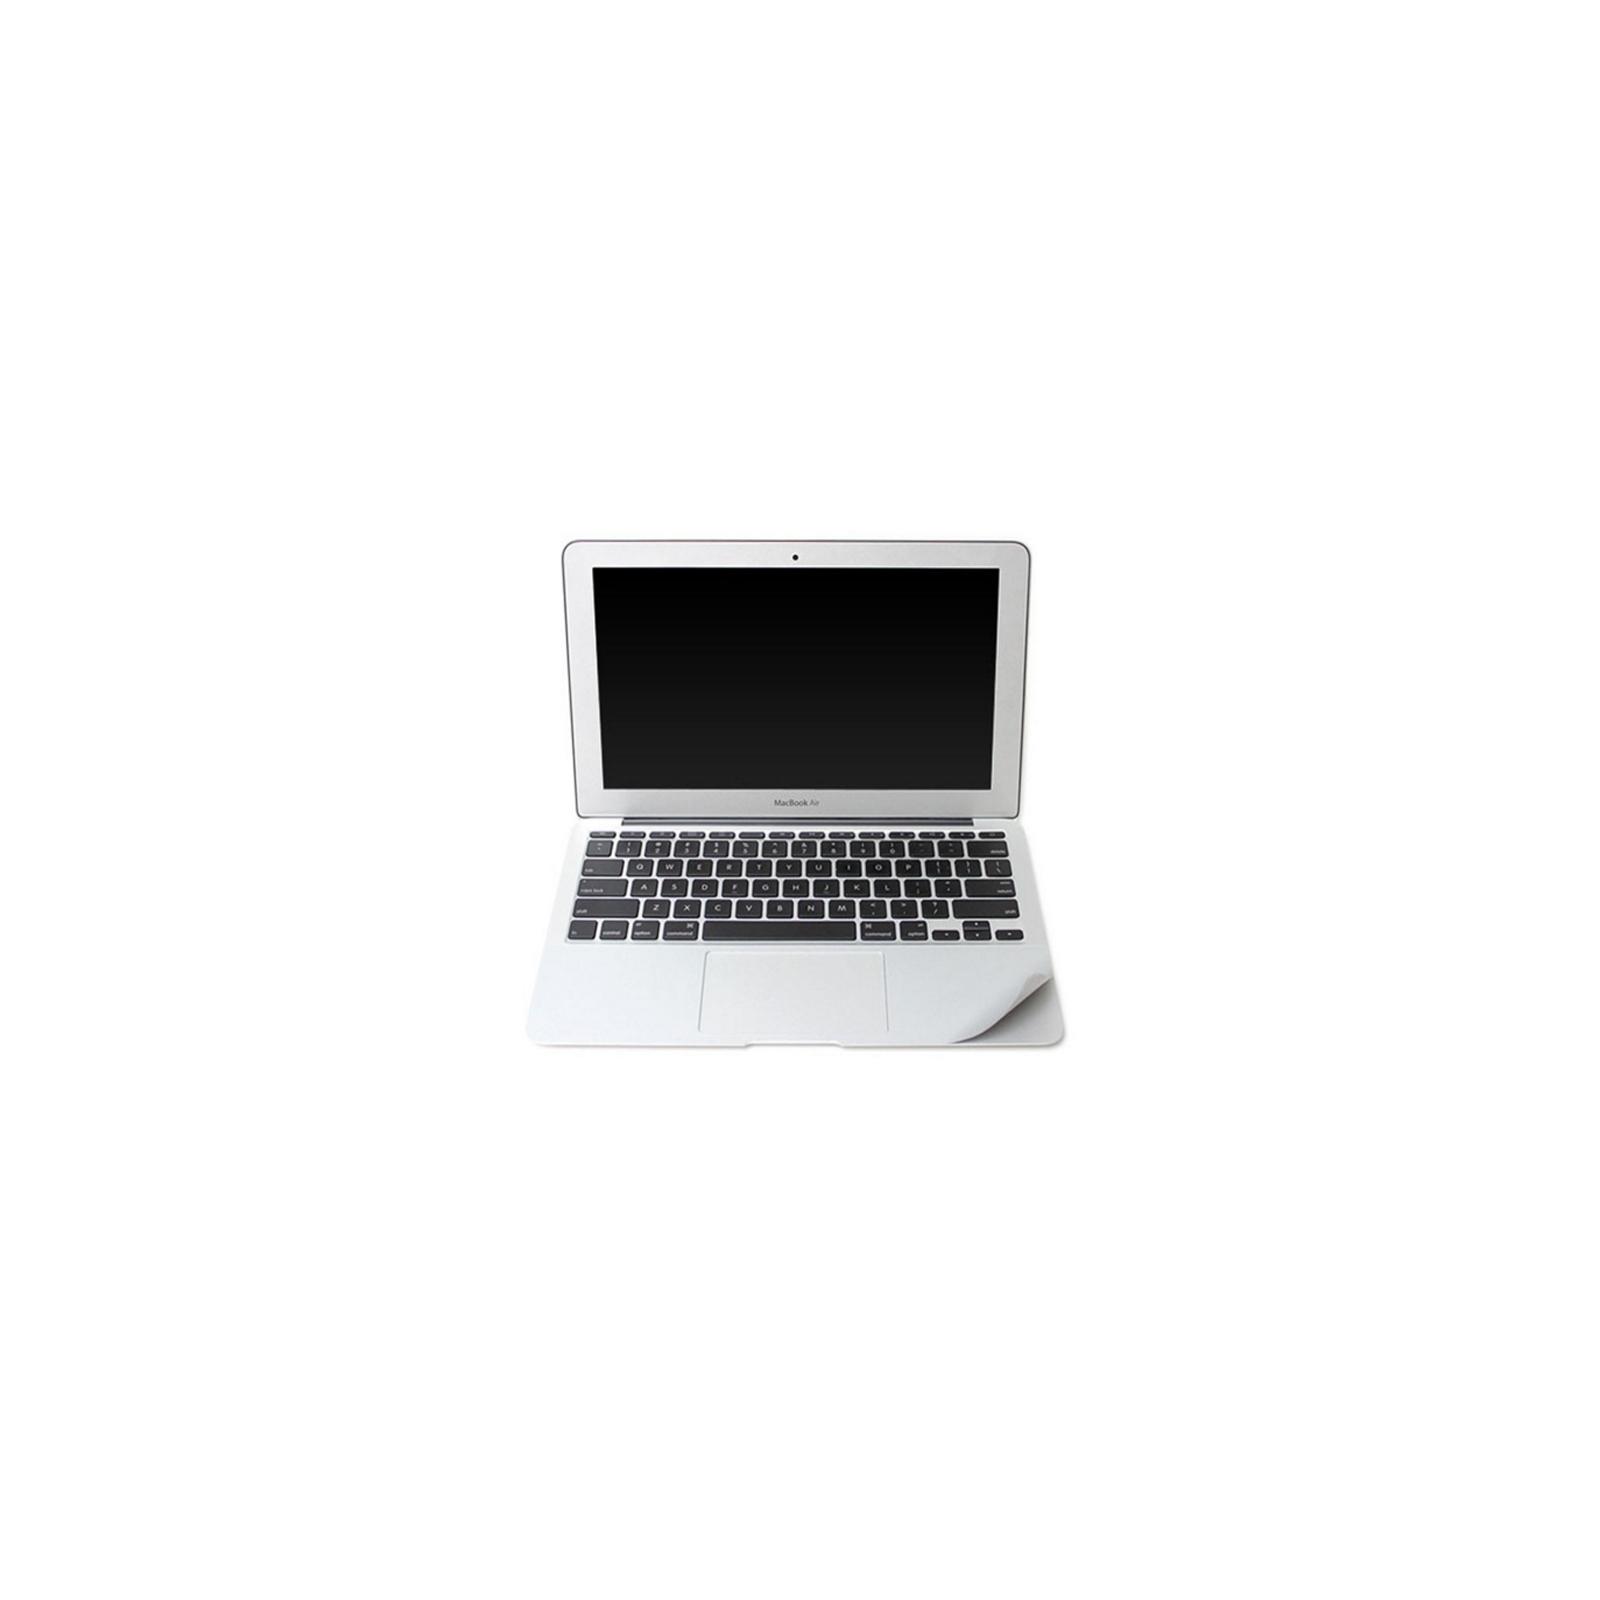 Пленка защитная JCPAL WristGuard Palm Guard для MacBook Pro 13 (JCP2014) изображение 4